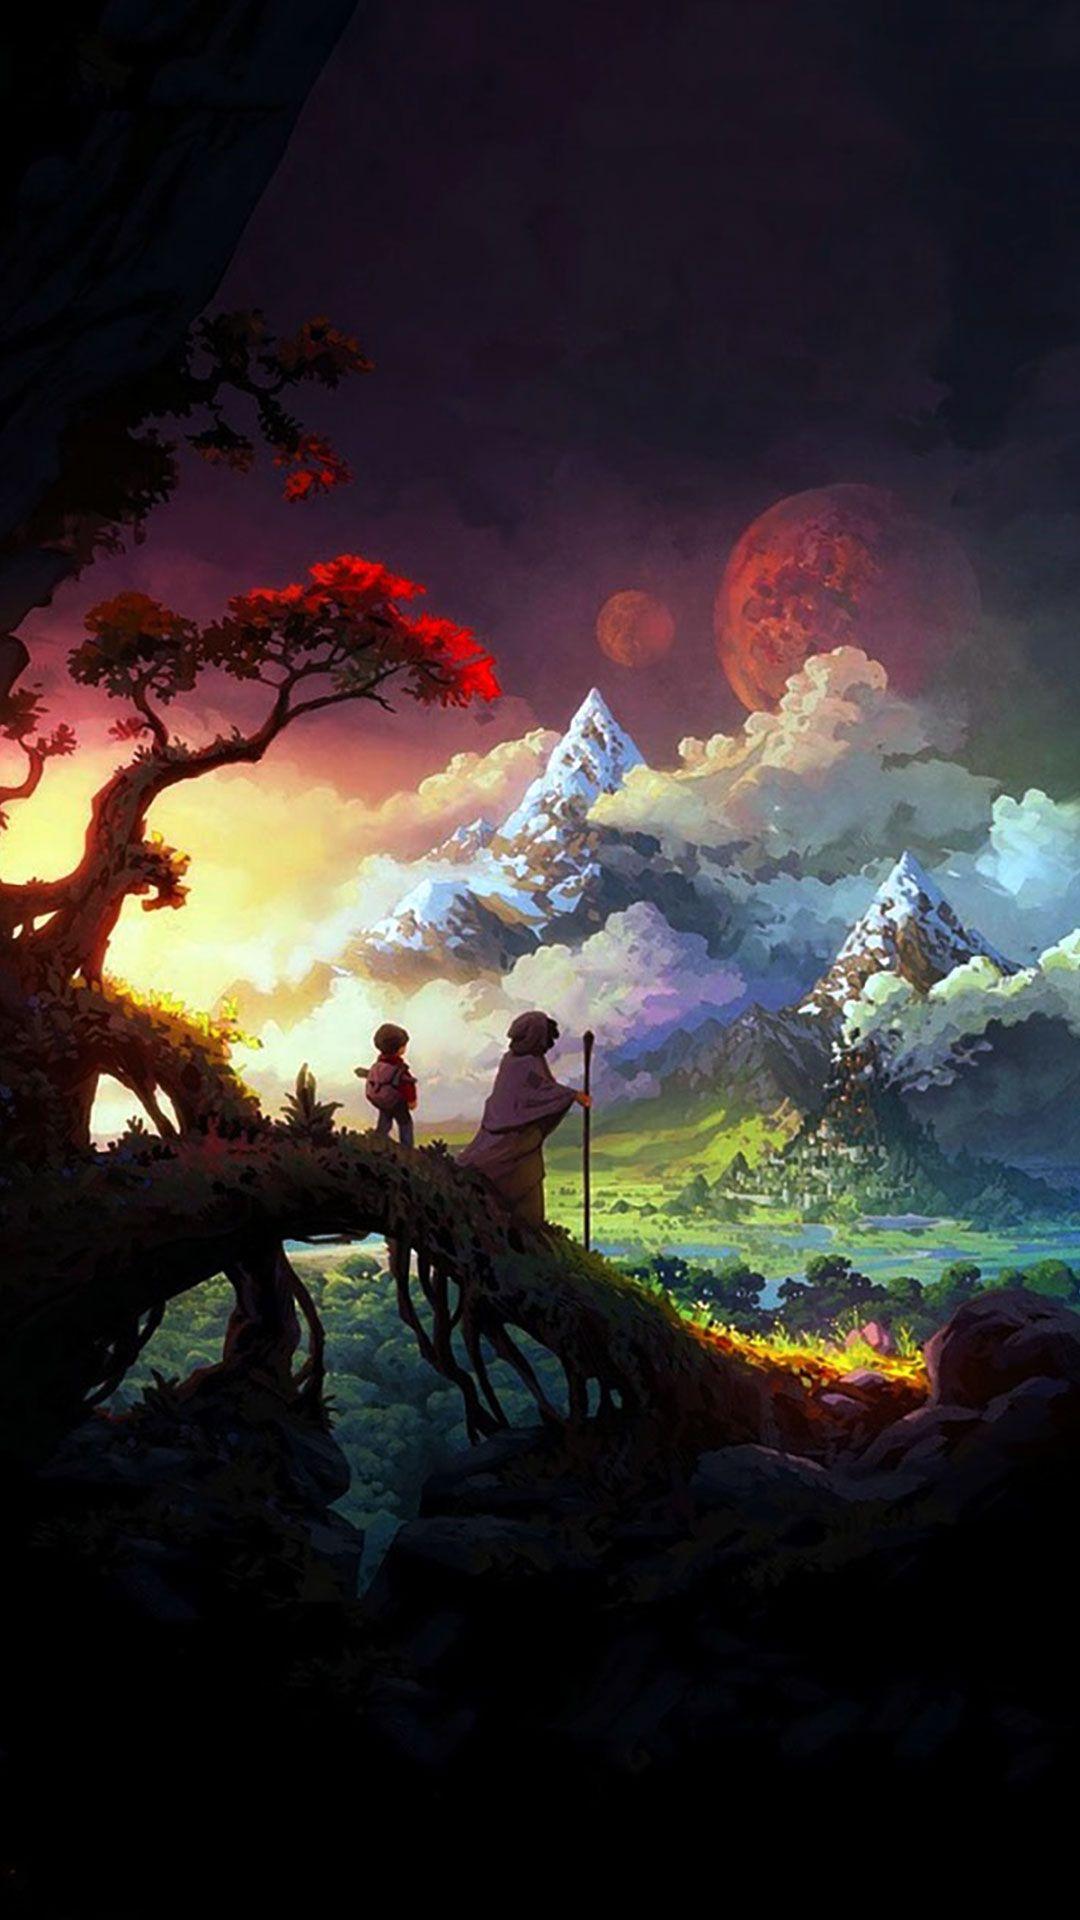 3d Animated Wallpaper For Iphone Best Wallpaper Hd Fantasy Landscape Fantasy Artist Fantasy